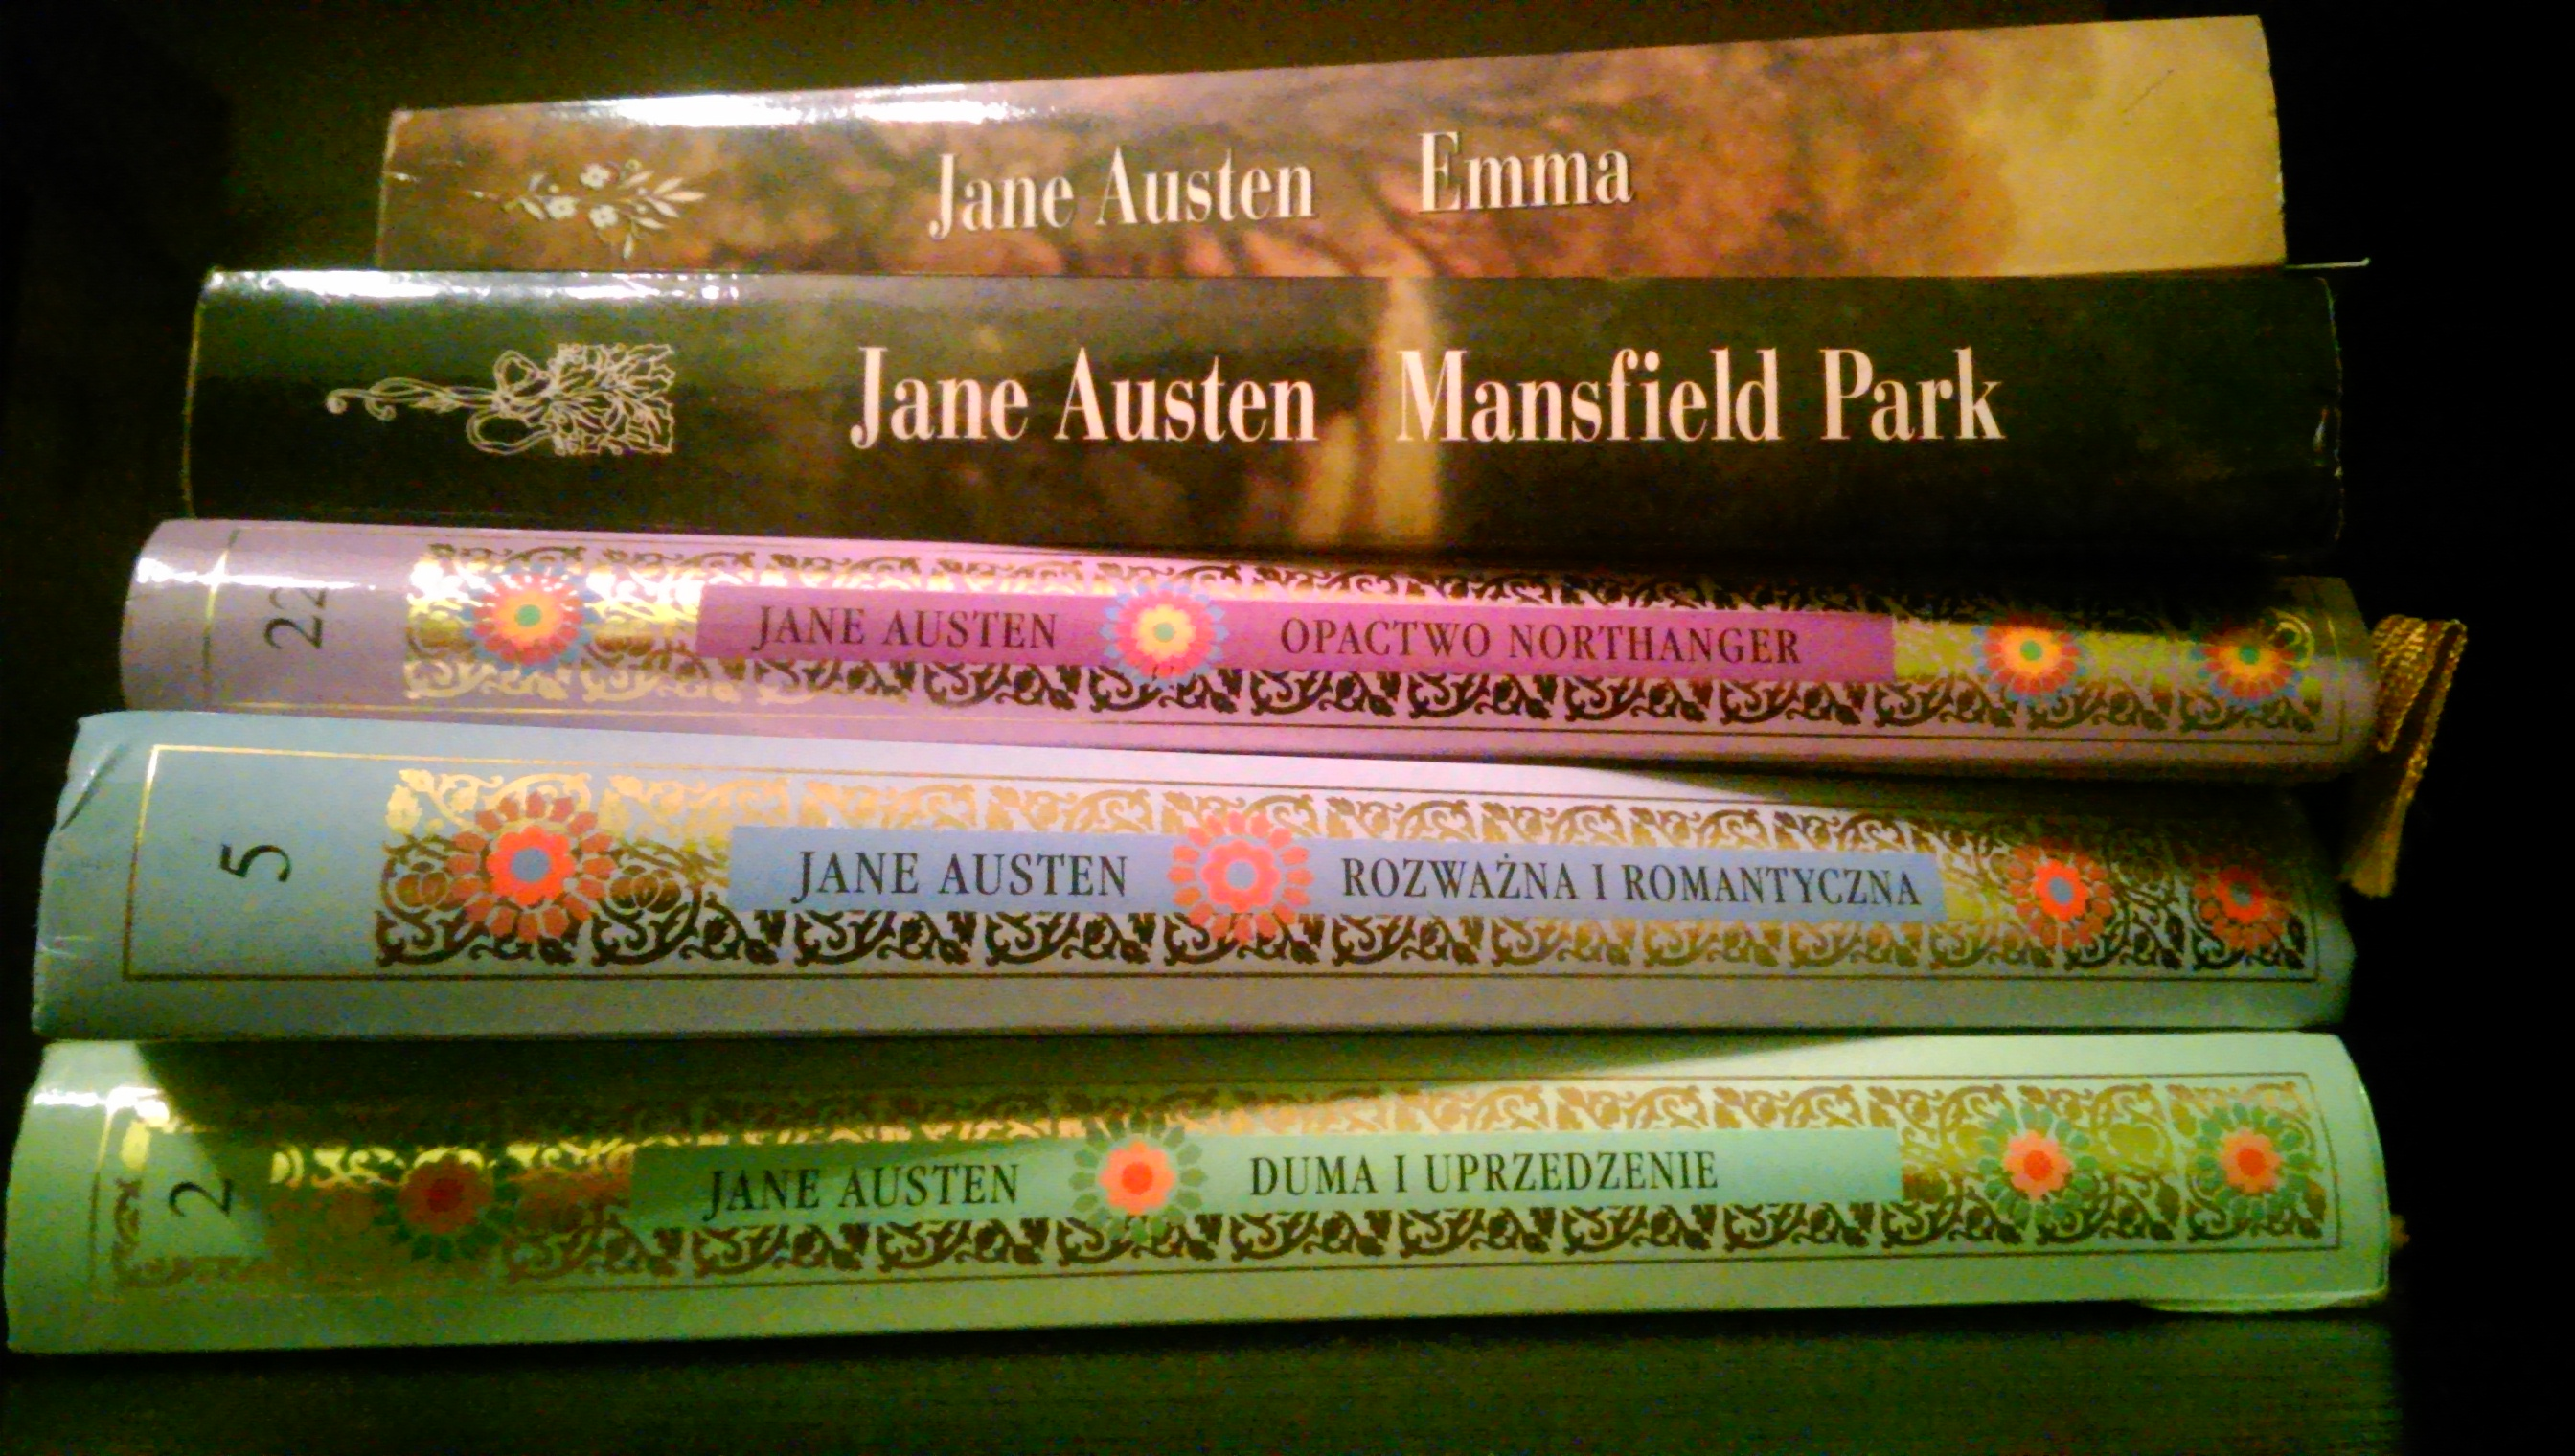 Jane Austen, 5 motivi per leggere i suoi libri